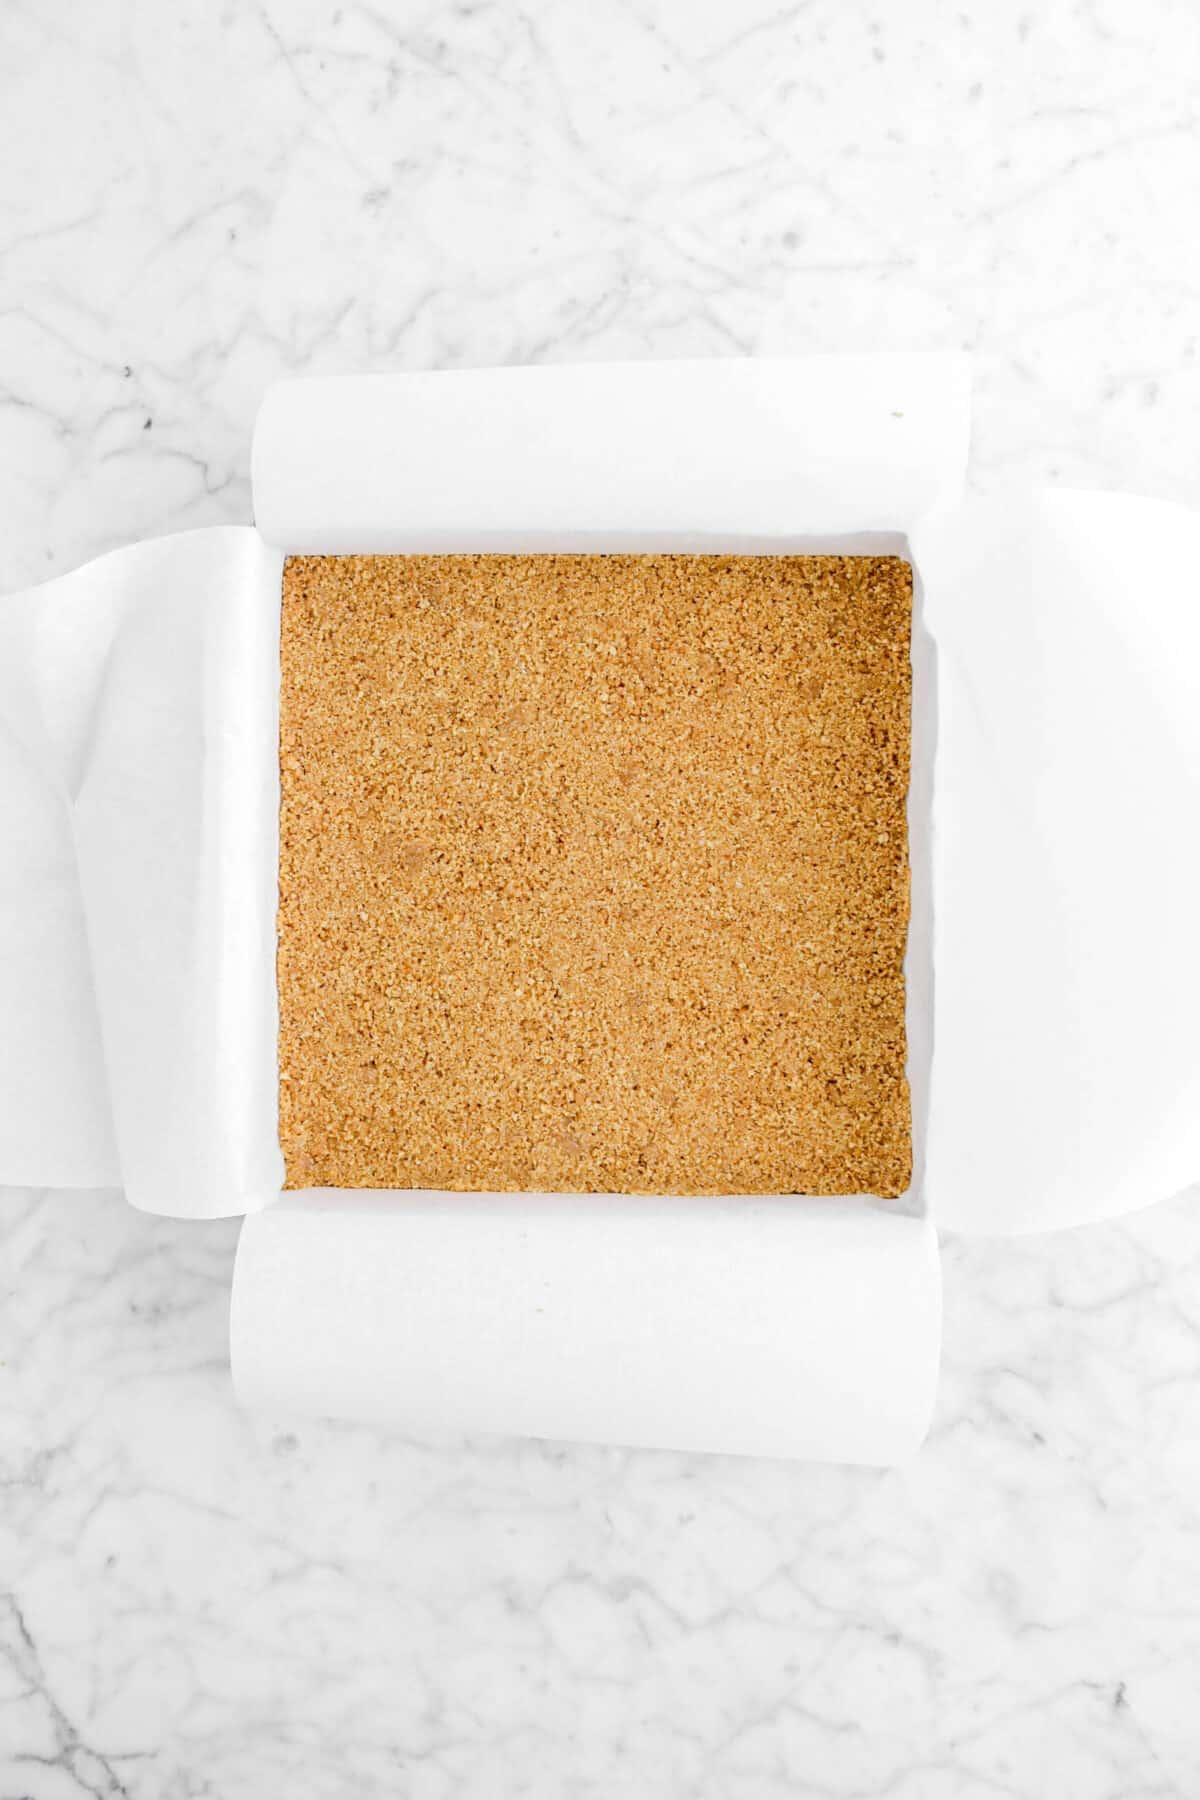 graham cracker crust in square baking pan